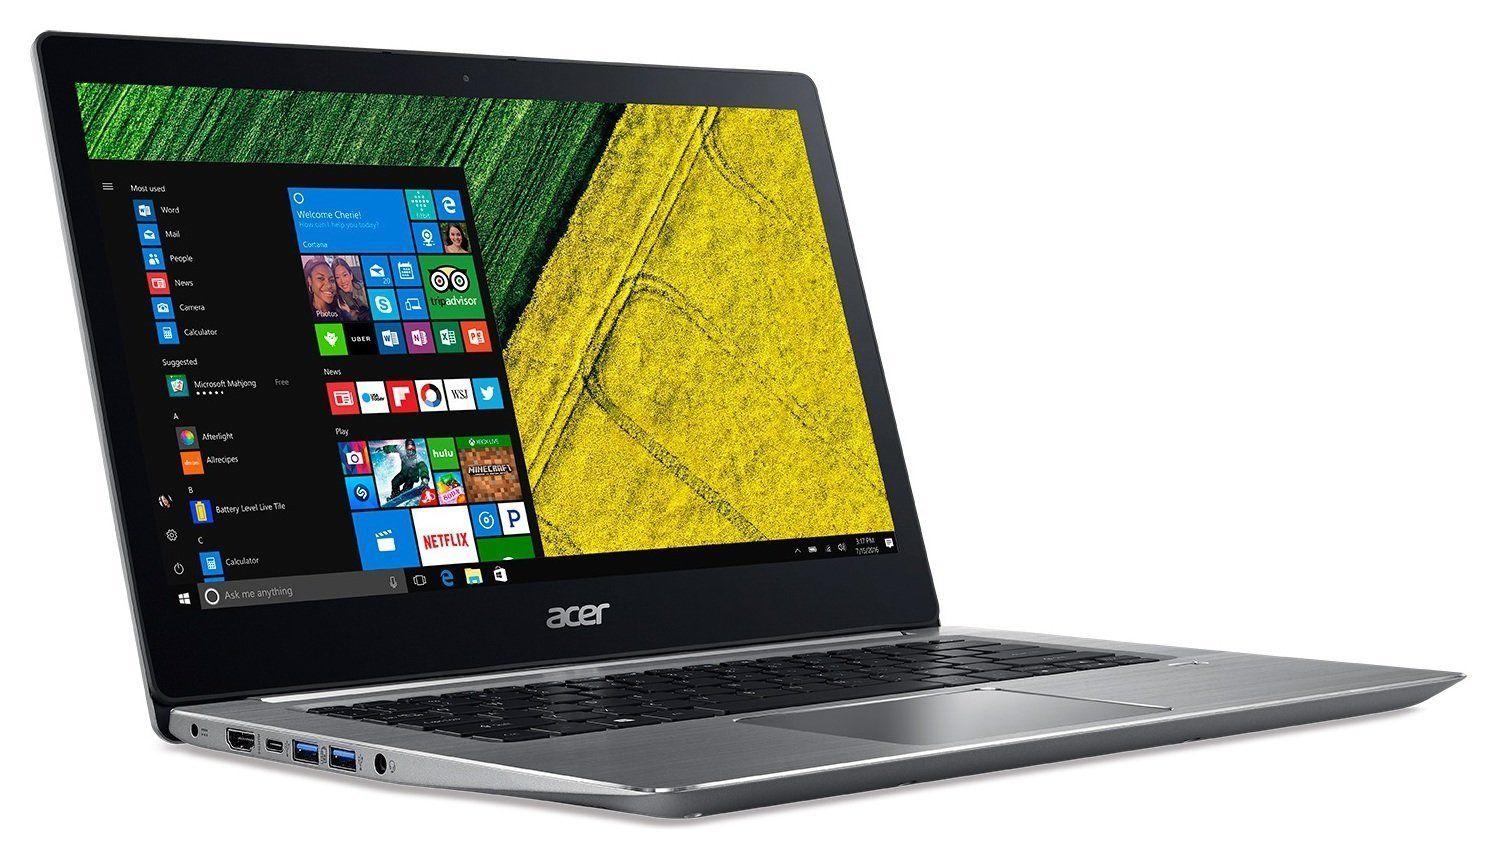 "Acer 14"" Swift 3 SF314-51 Laptop - Intel Core i3, 8GB RAM, 128GB SSD, Ful-HD IPS, Aluminium Casing, Fingerprint Reader, USB Type-C (Refurbished) £307.99 @ Argos Ebay"